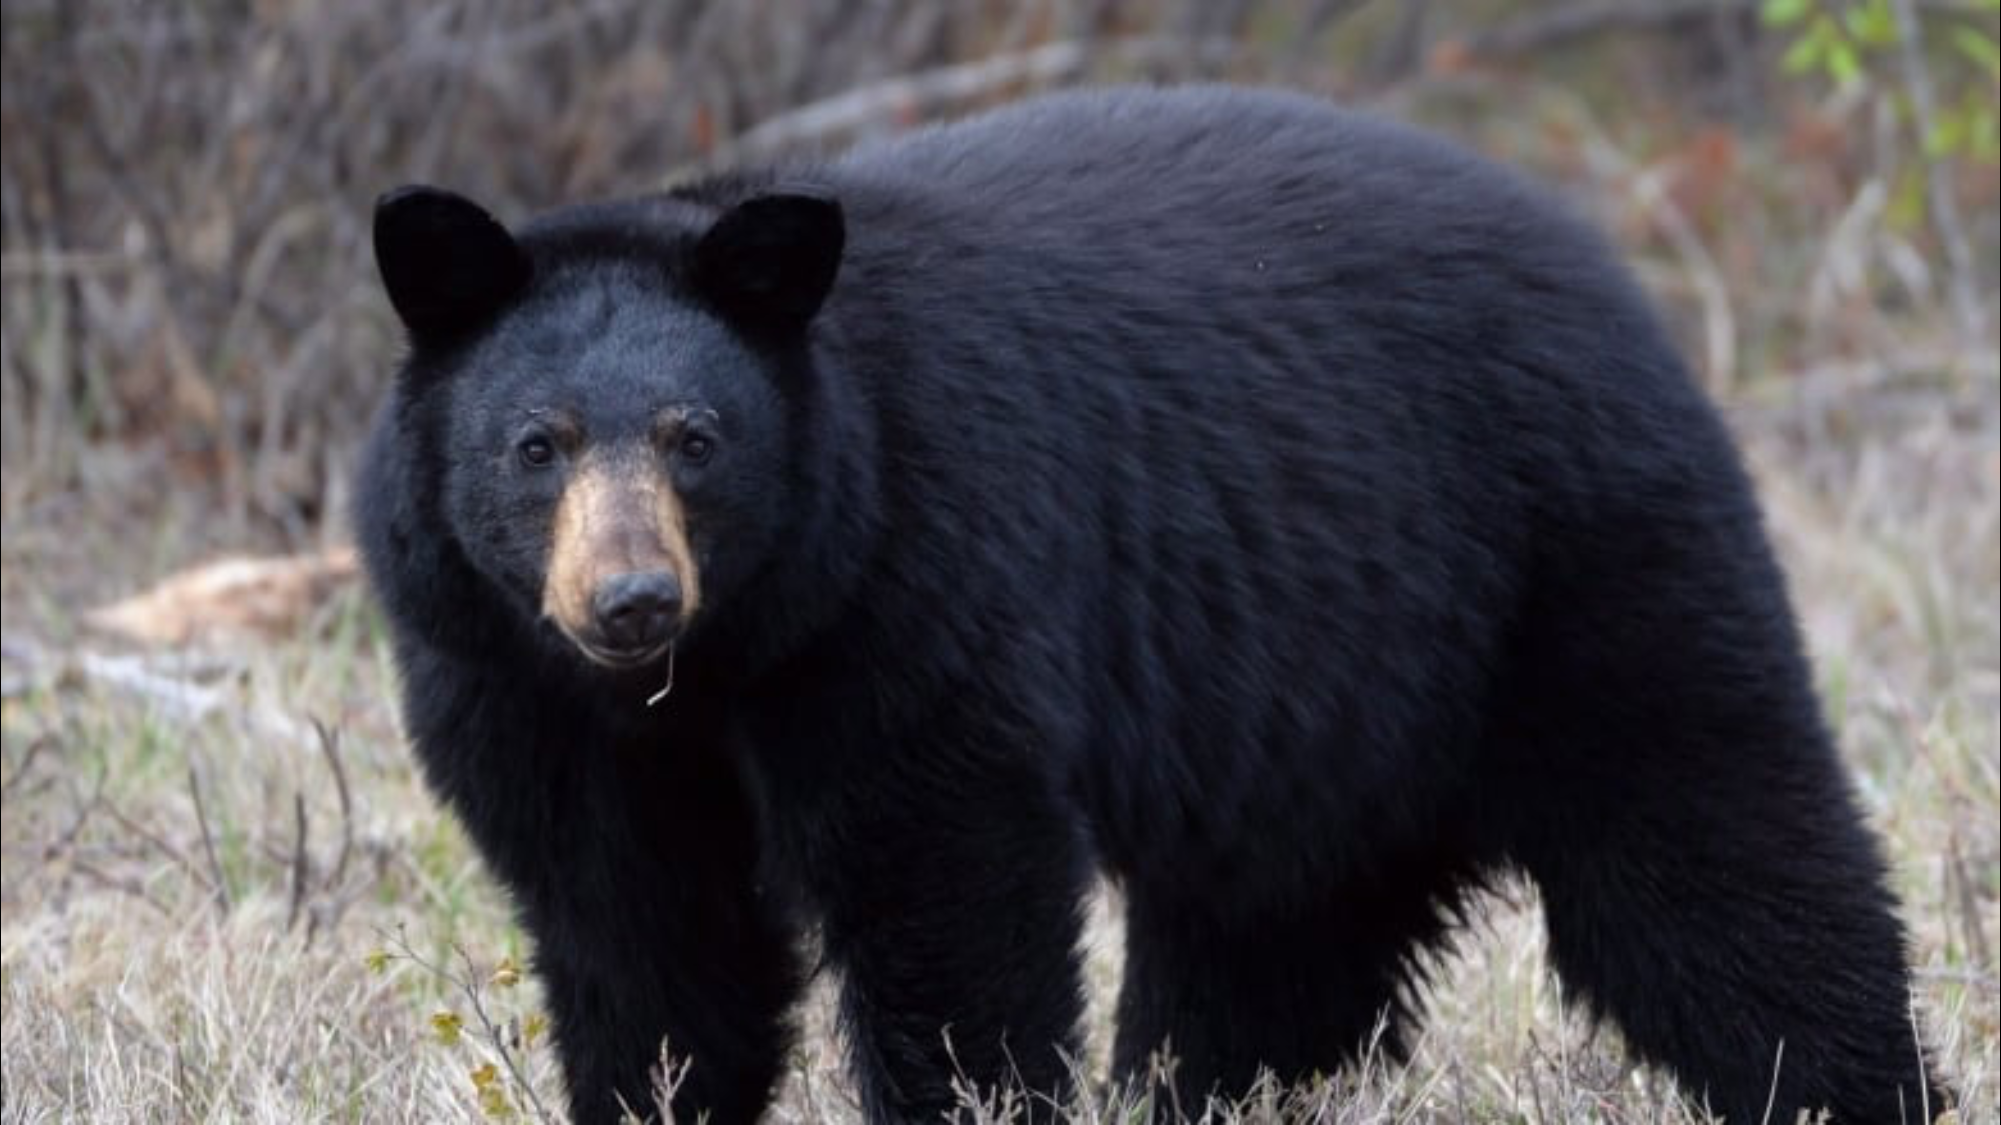 Pin By Melea Thomson On Bears Black Bear Hunting Black Bear Bear Hunting